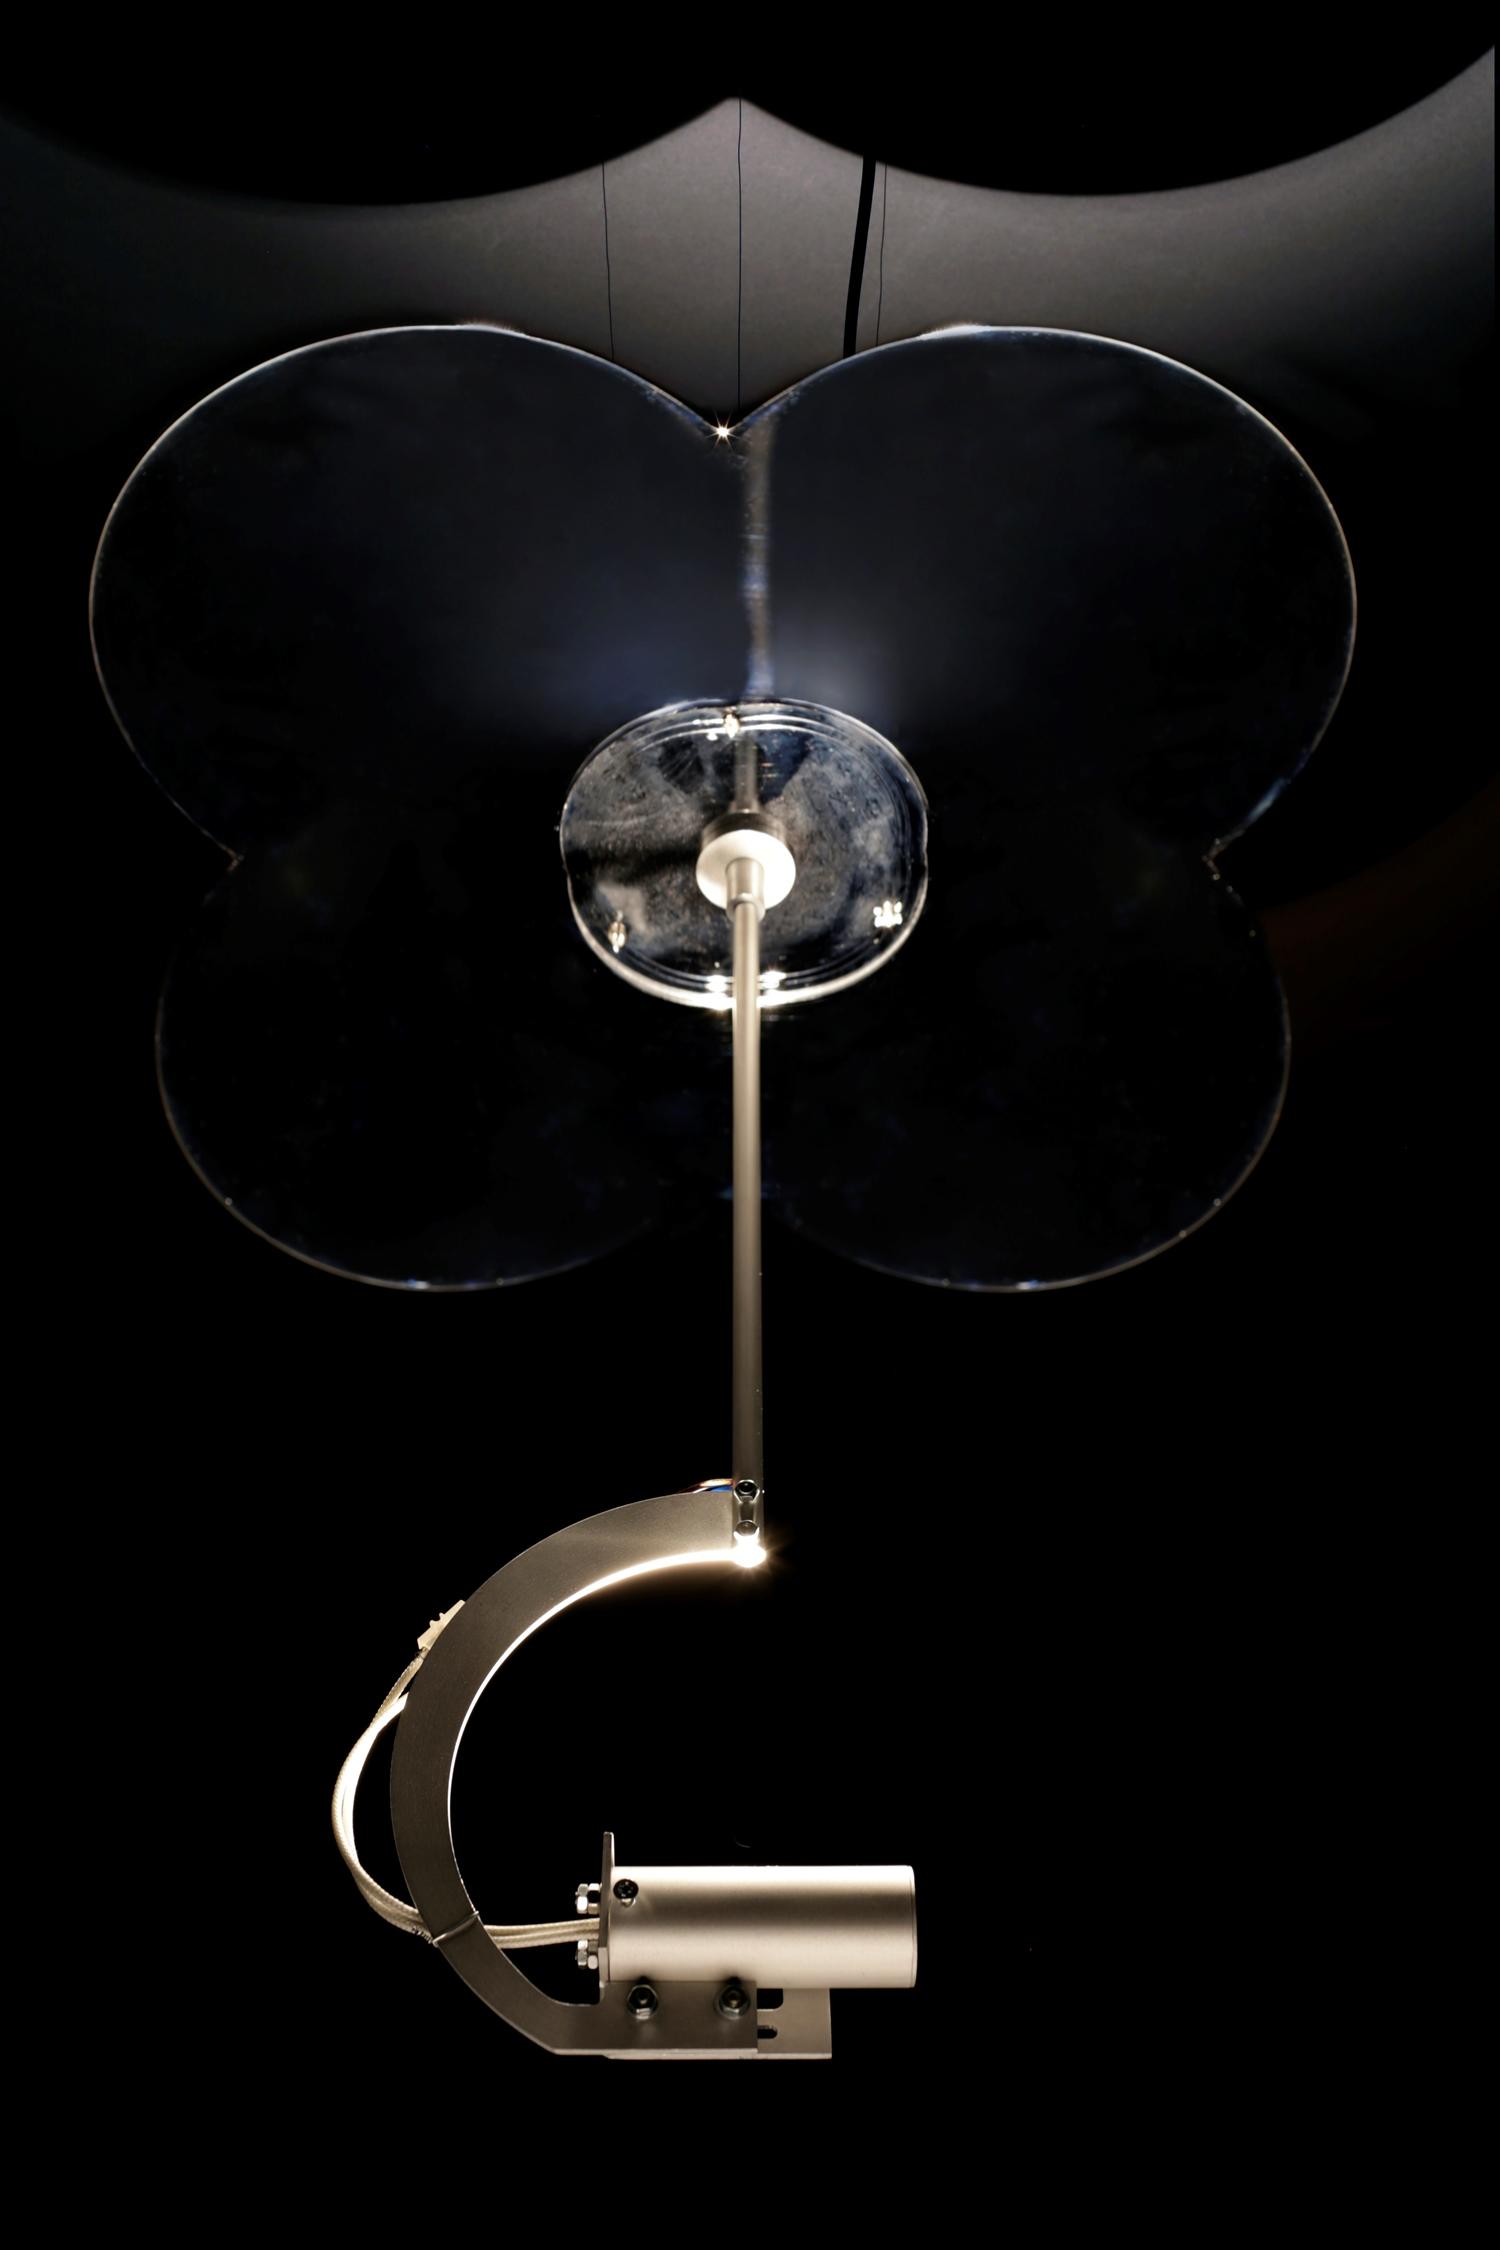 A kör négyszögesítése / Squaring the Circle, 2012. light sculpture, 3-dimensional chrome plated aluminium mirror, halogen lamp, transformer, fibreglass circle, 160 x 40 x 40 cm, Ed. of 3.